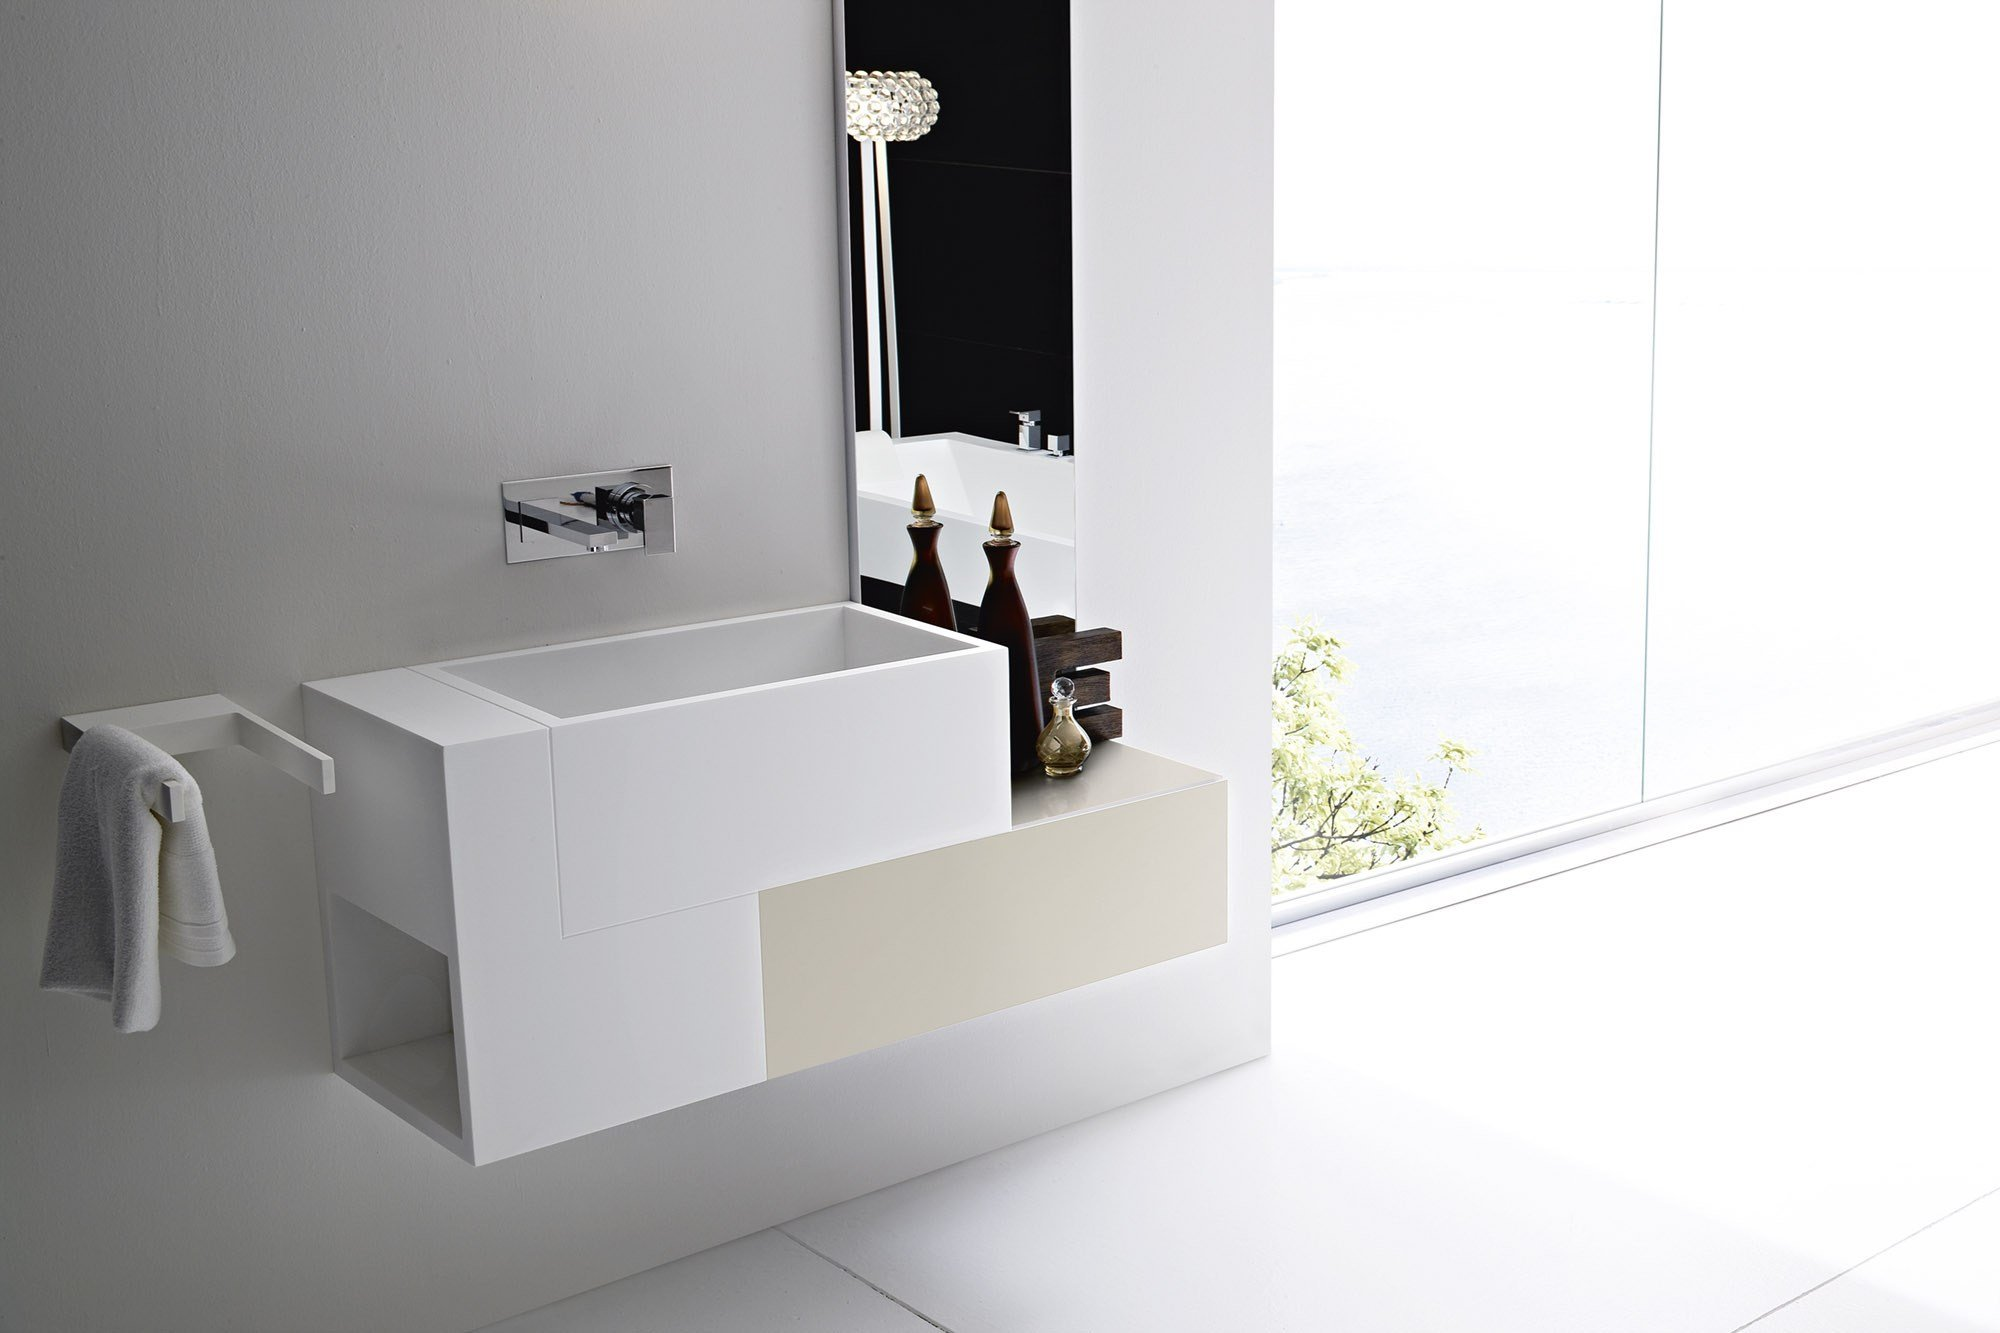 Argo meuble pour salle de bain avec tiroirs by rexa design for Meubles pour salle de bain